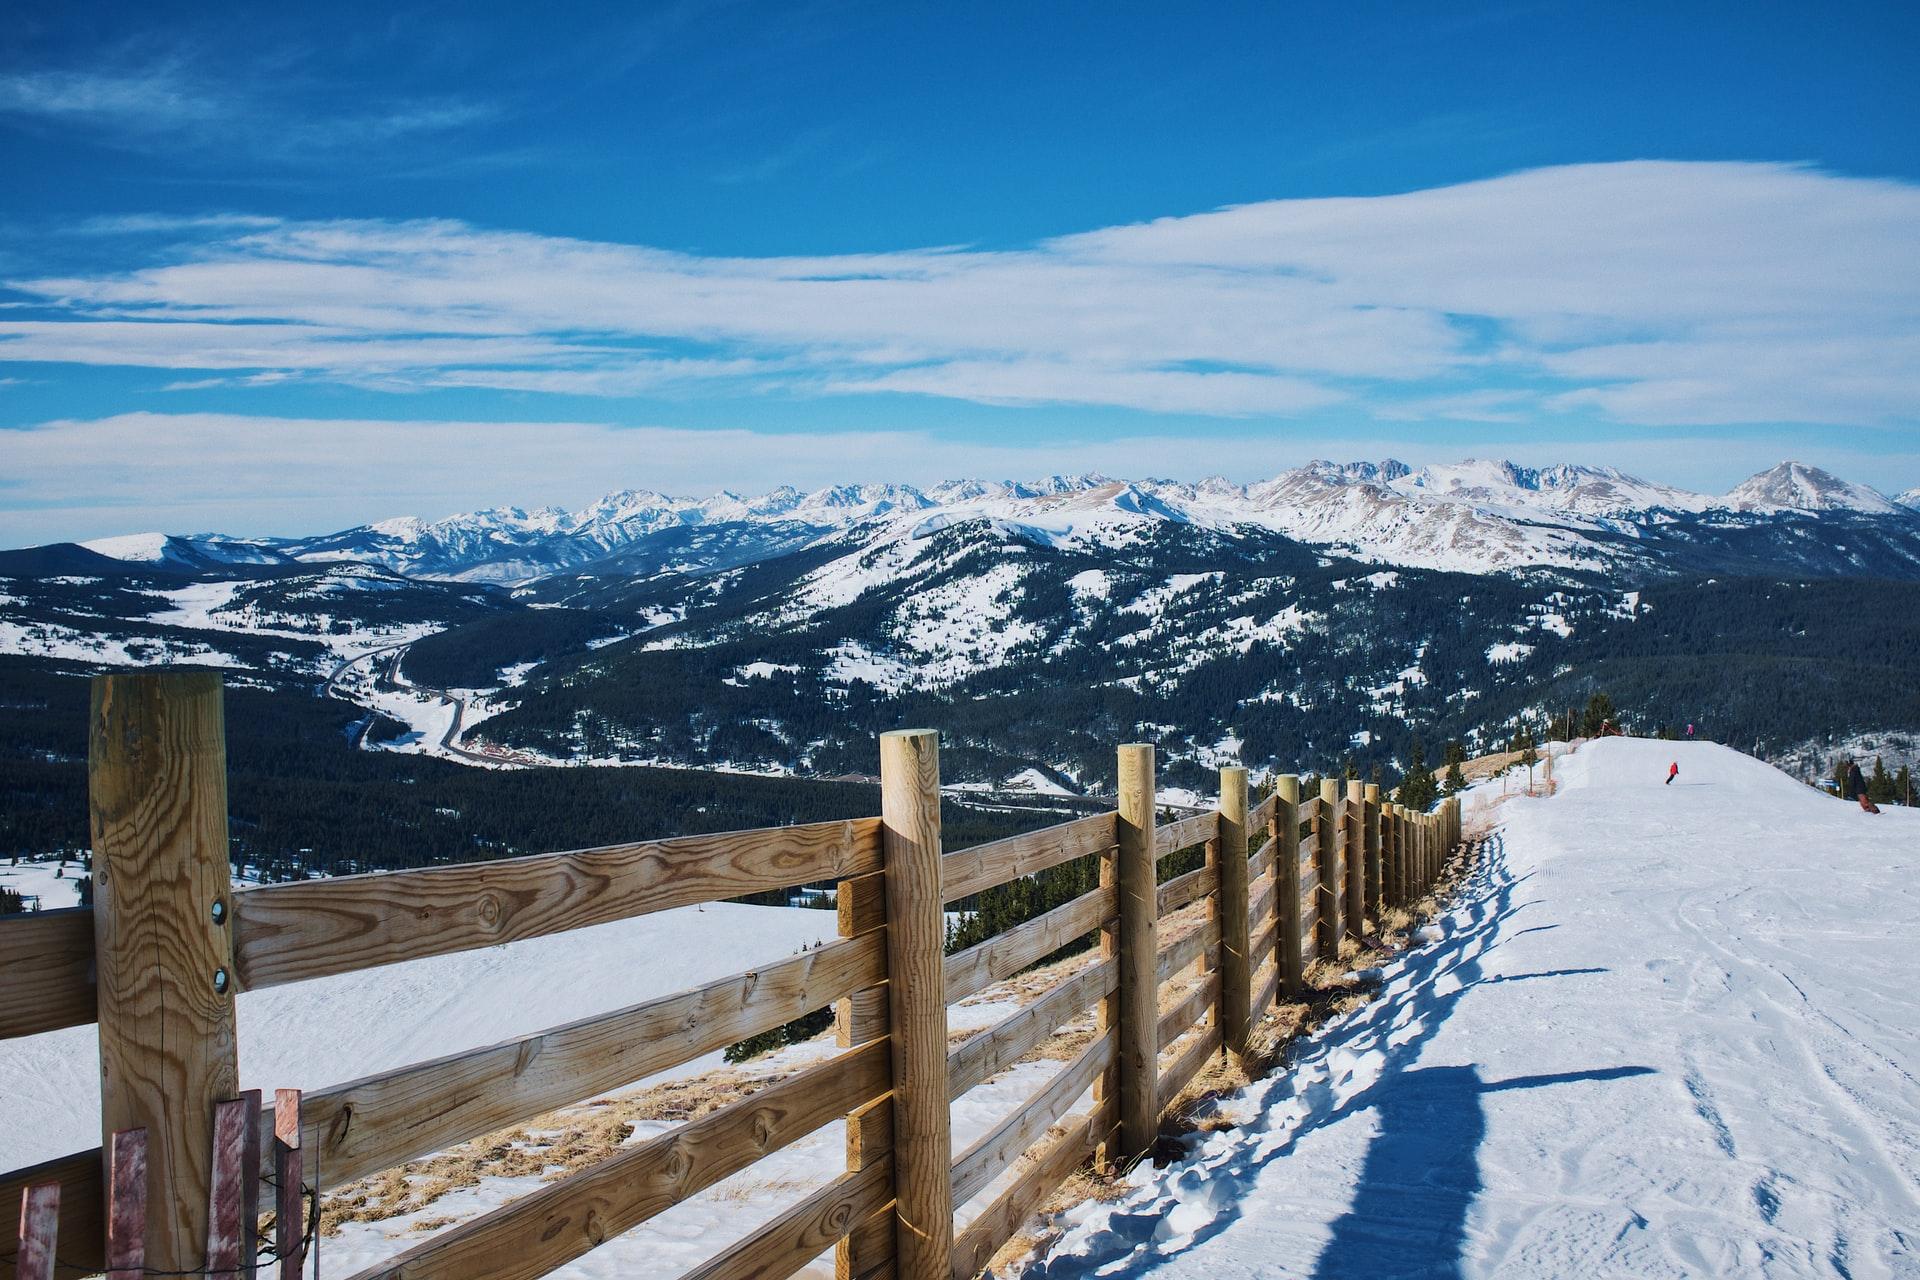 Wooden fence at Breckenridge Ski resort